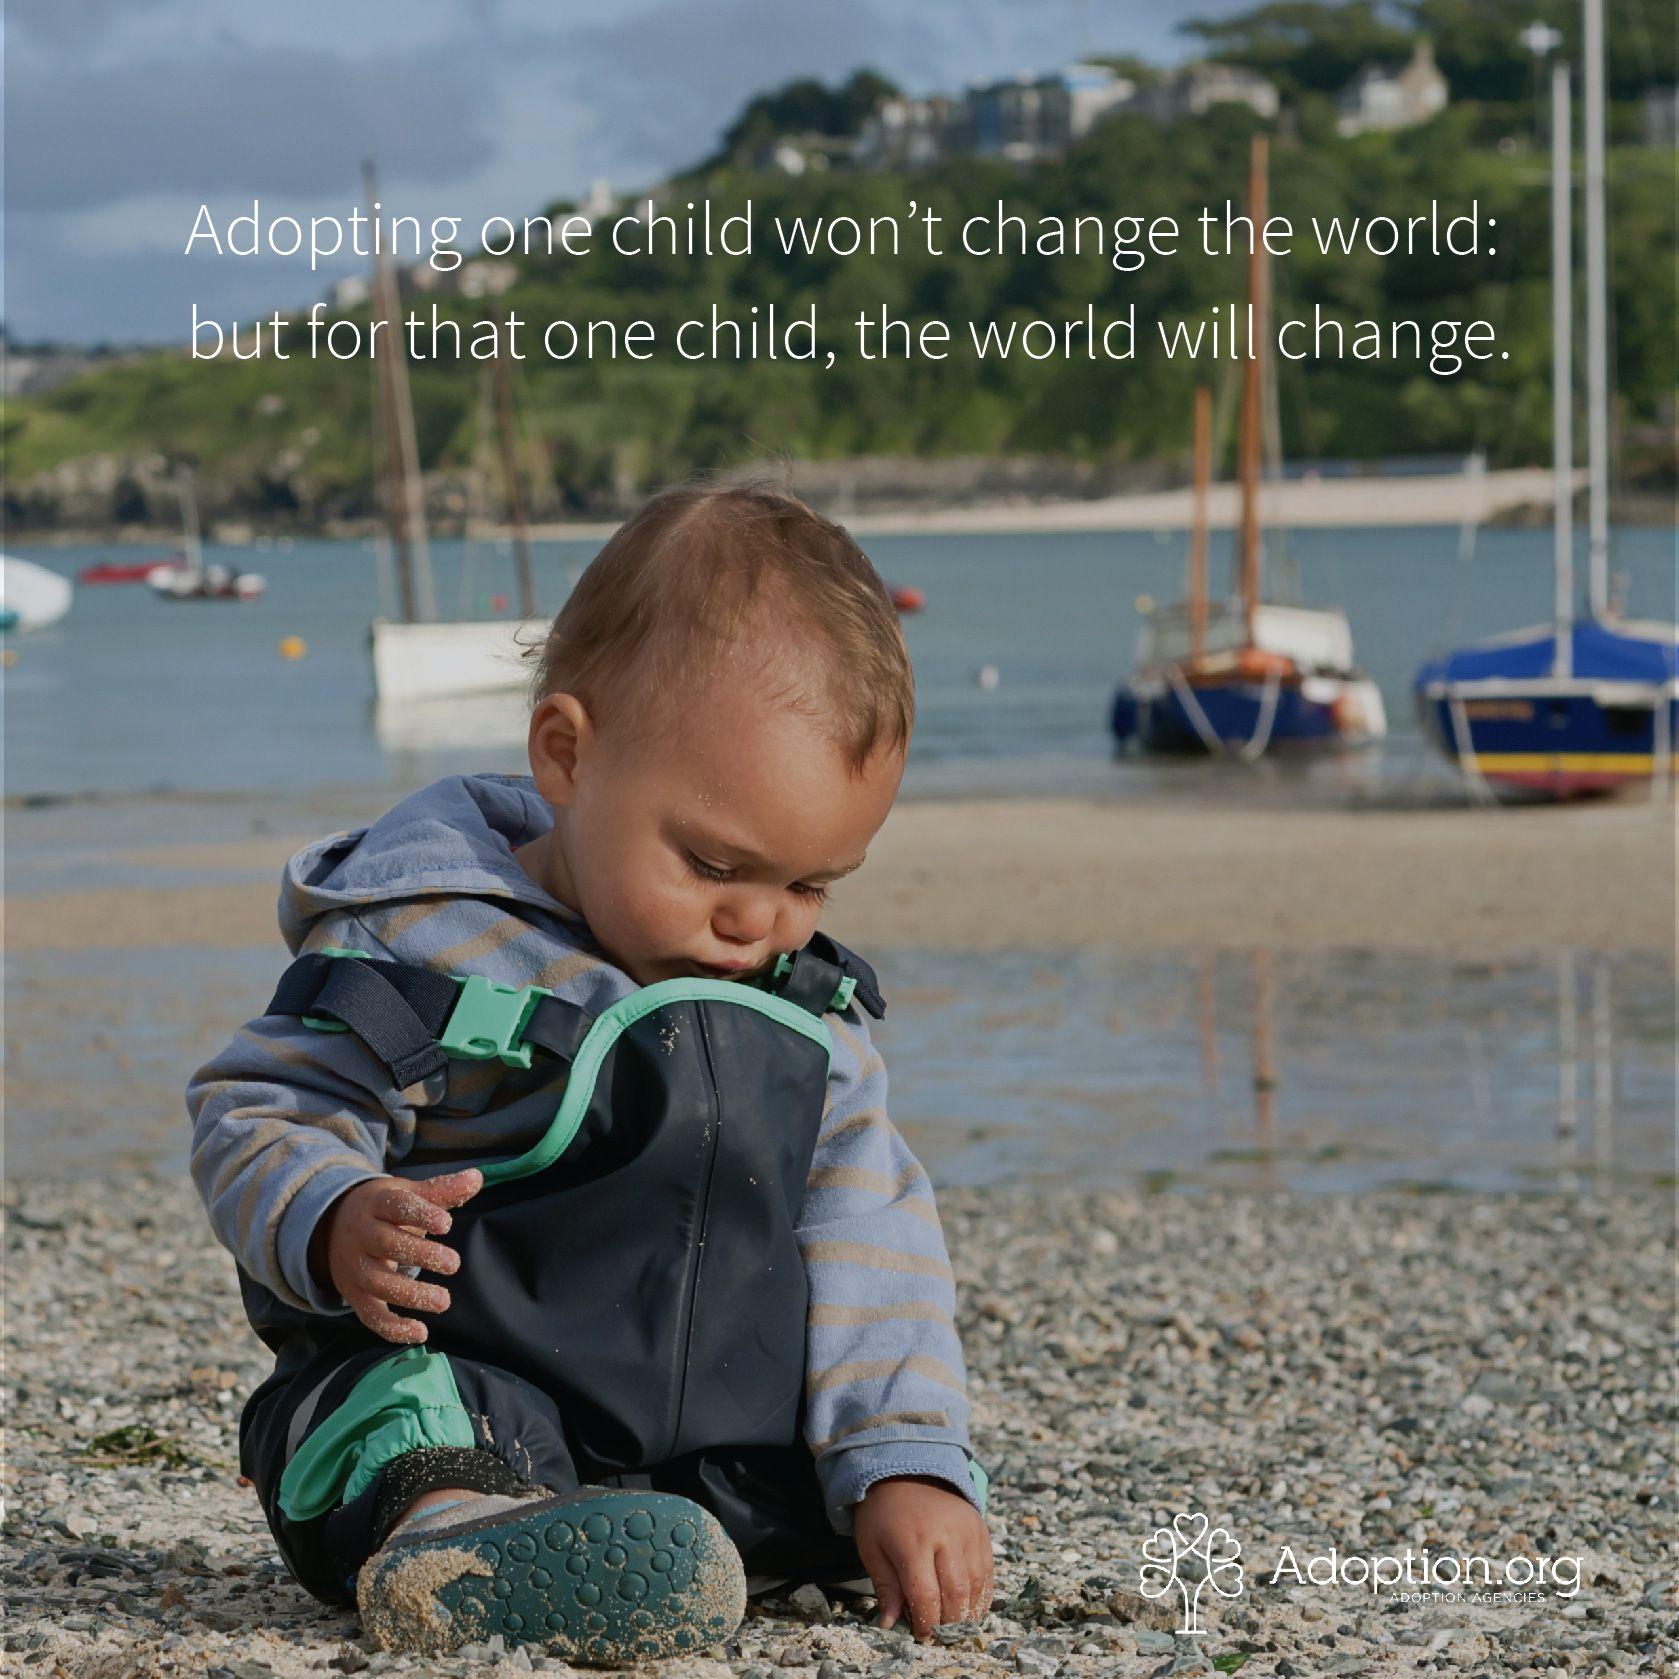 Adopting One Child Won T Change The World But For That One Child The World Will Change Adoption Ad Adoption Resources Adoption Quotes Step Parent Adoption